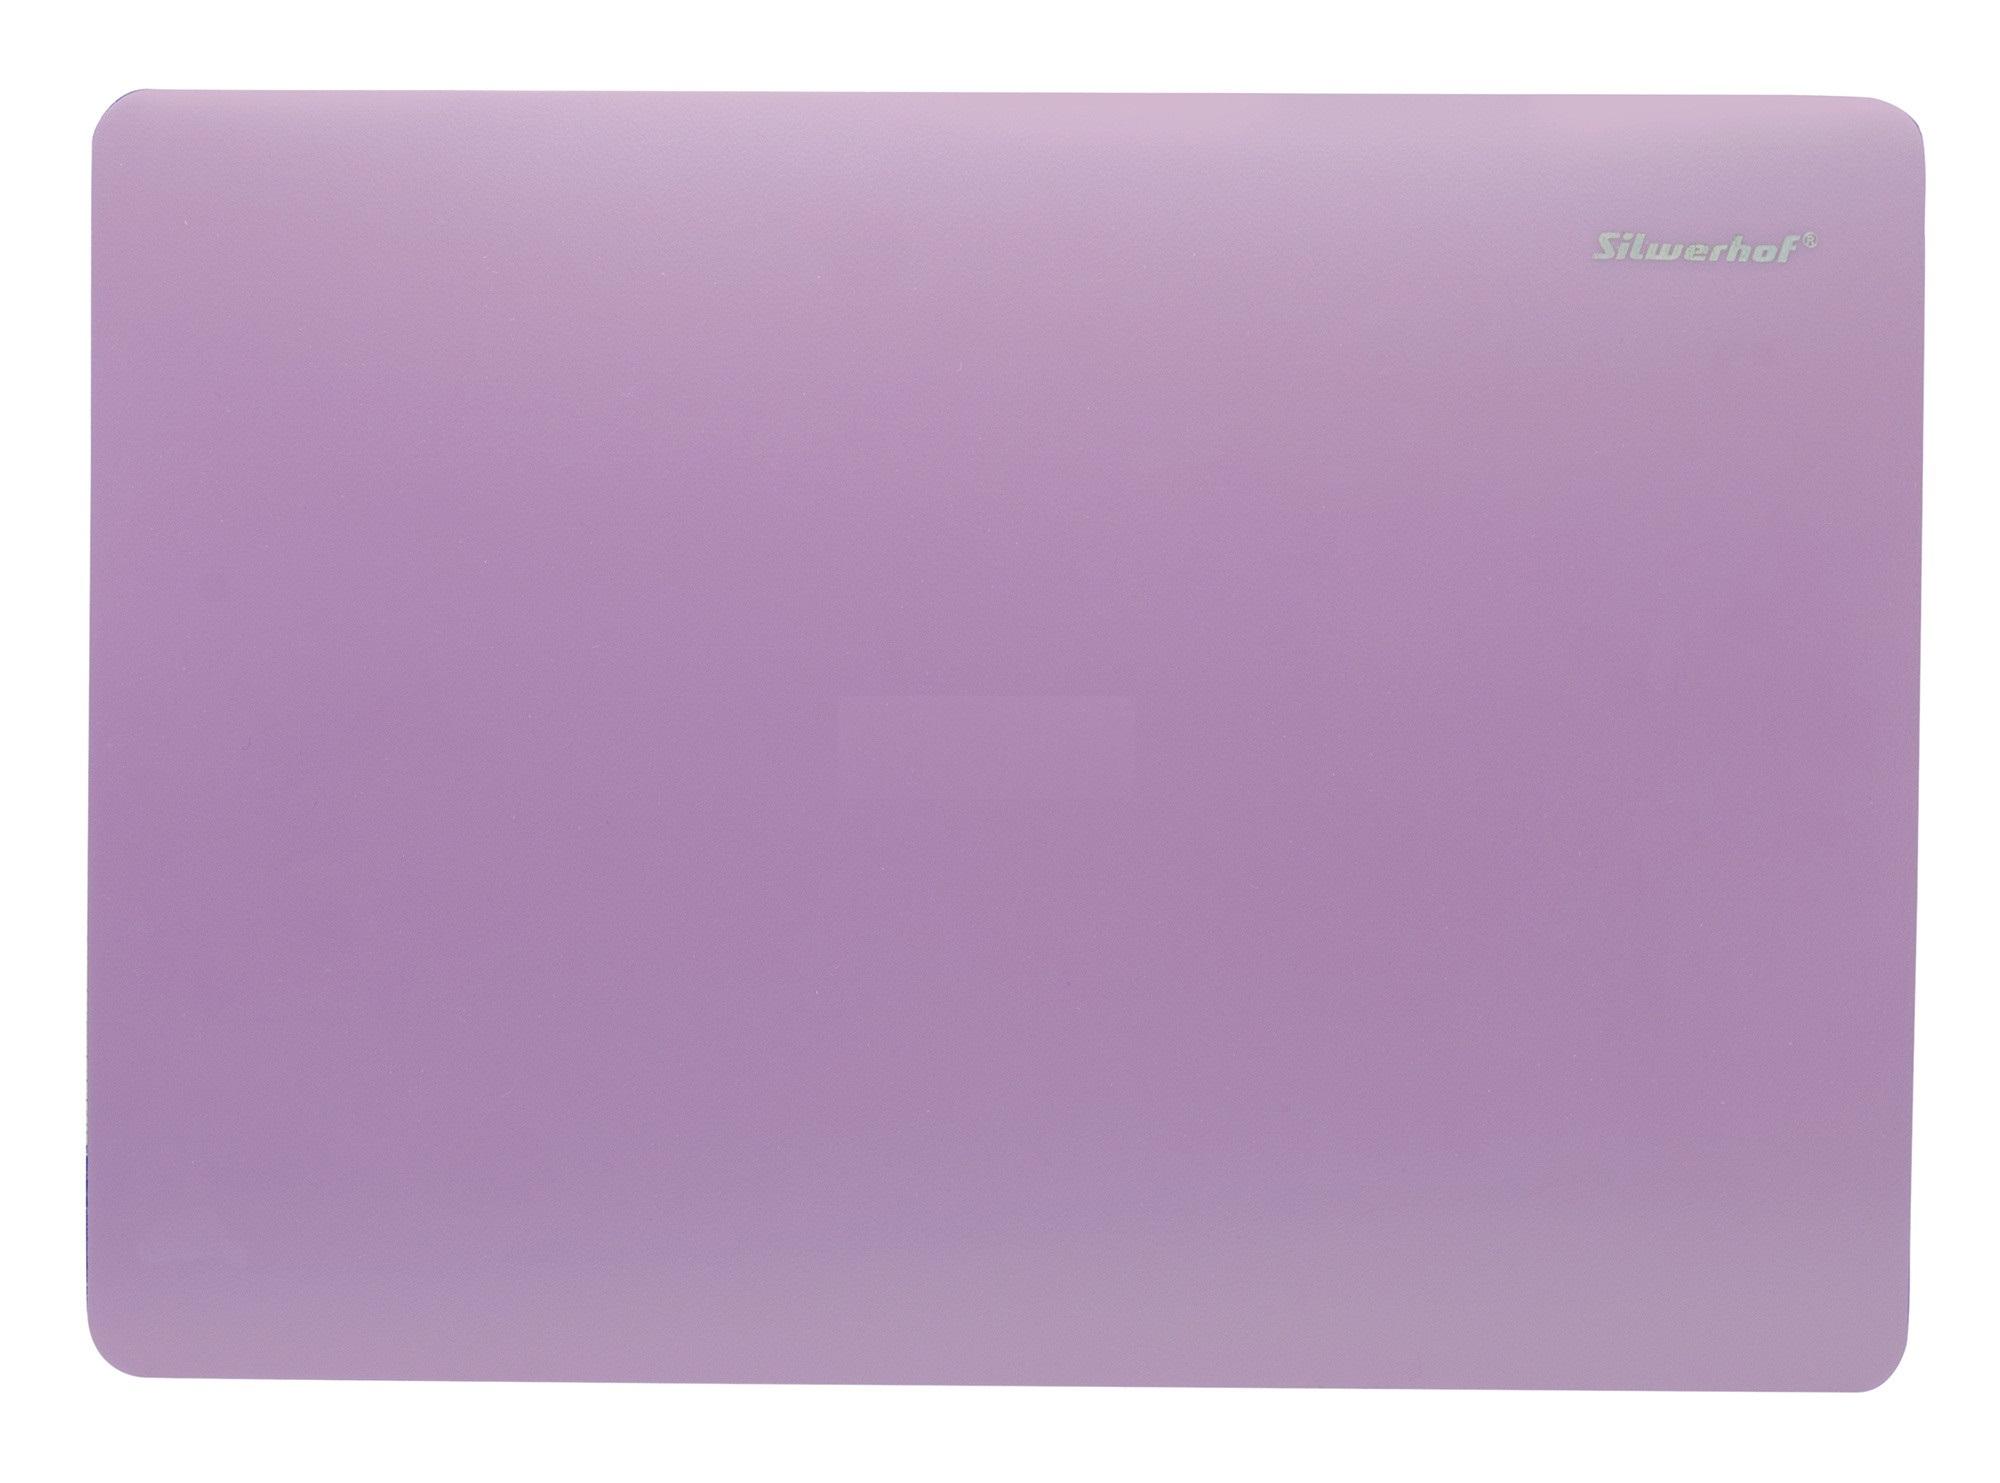 Доска для лепки А4 Silwerhof Pearl пластик 1мм розовая